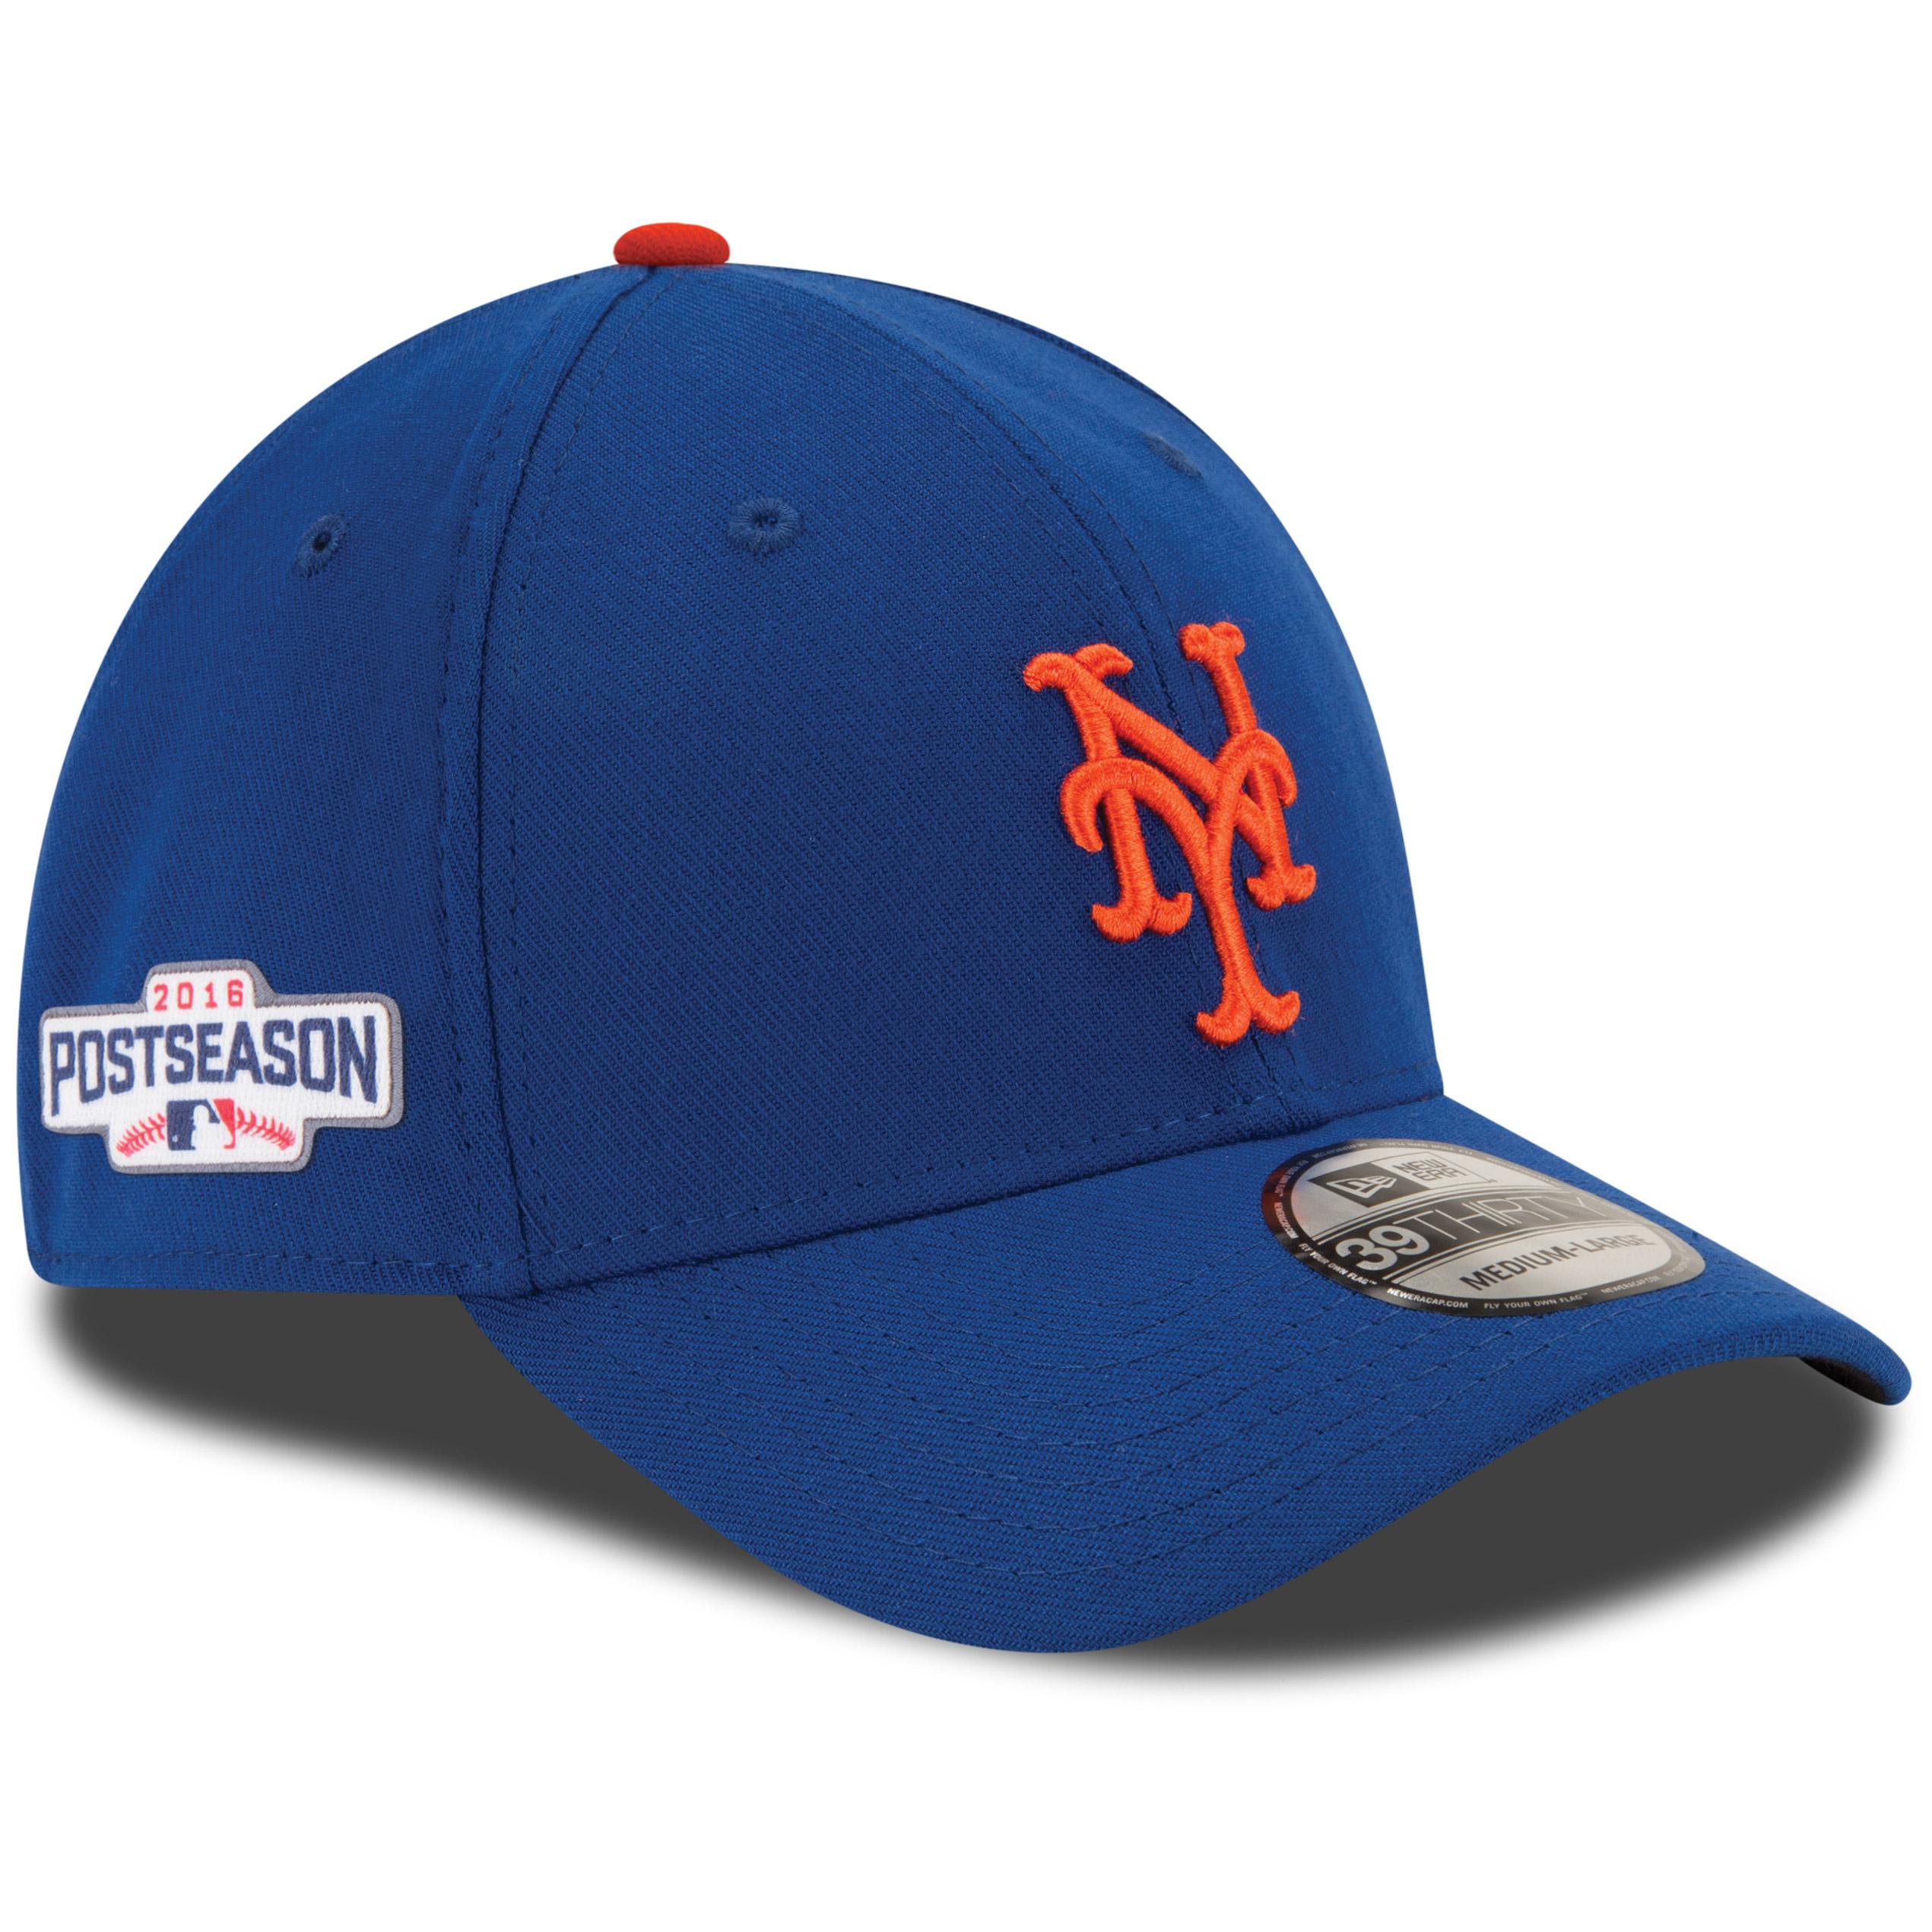 New York Mets New Era 2016 Postseason Side Patch 39THIRTY Flex Hat - Royal